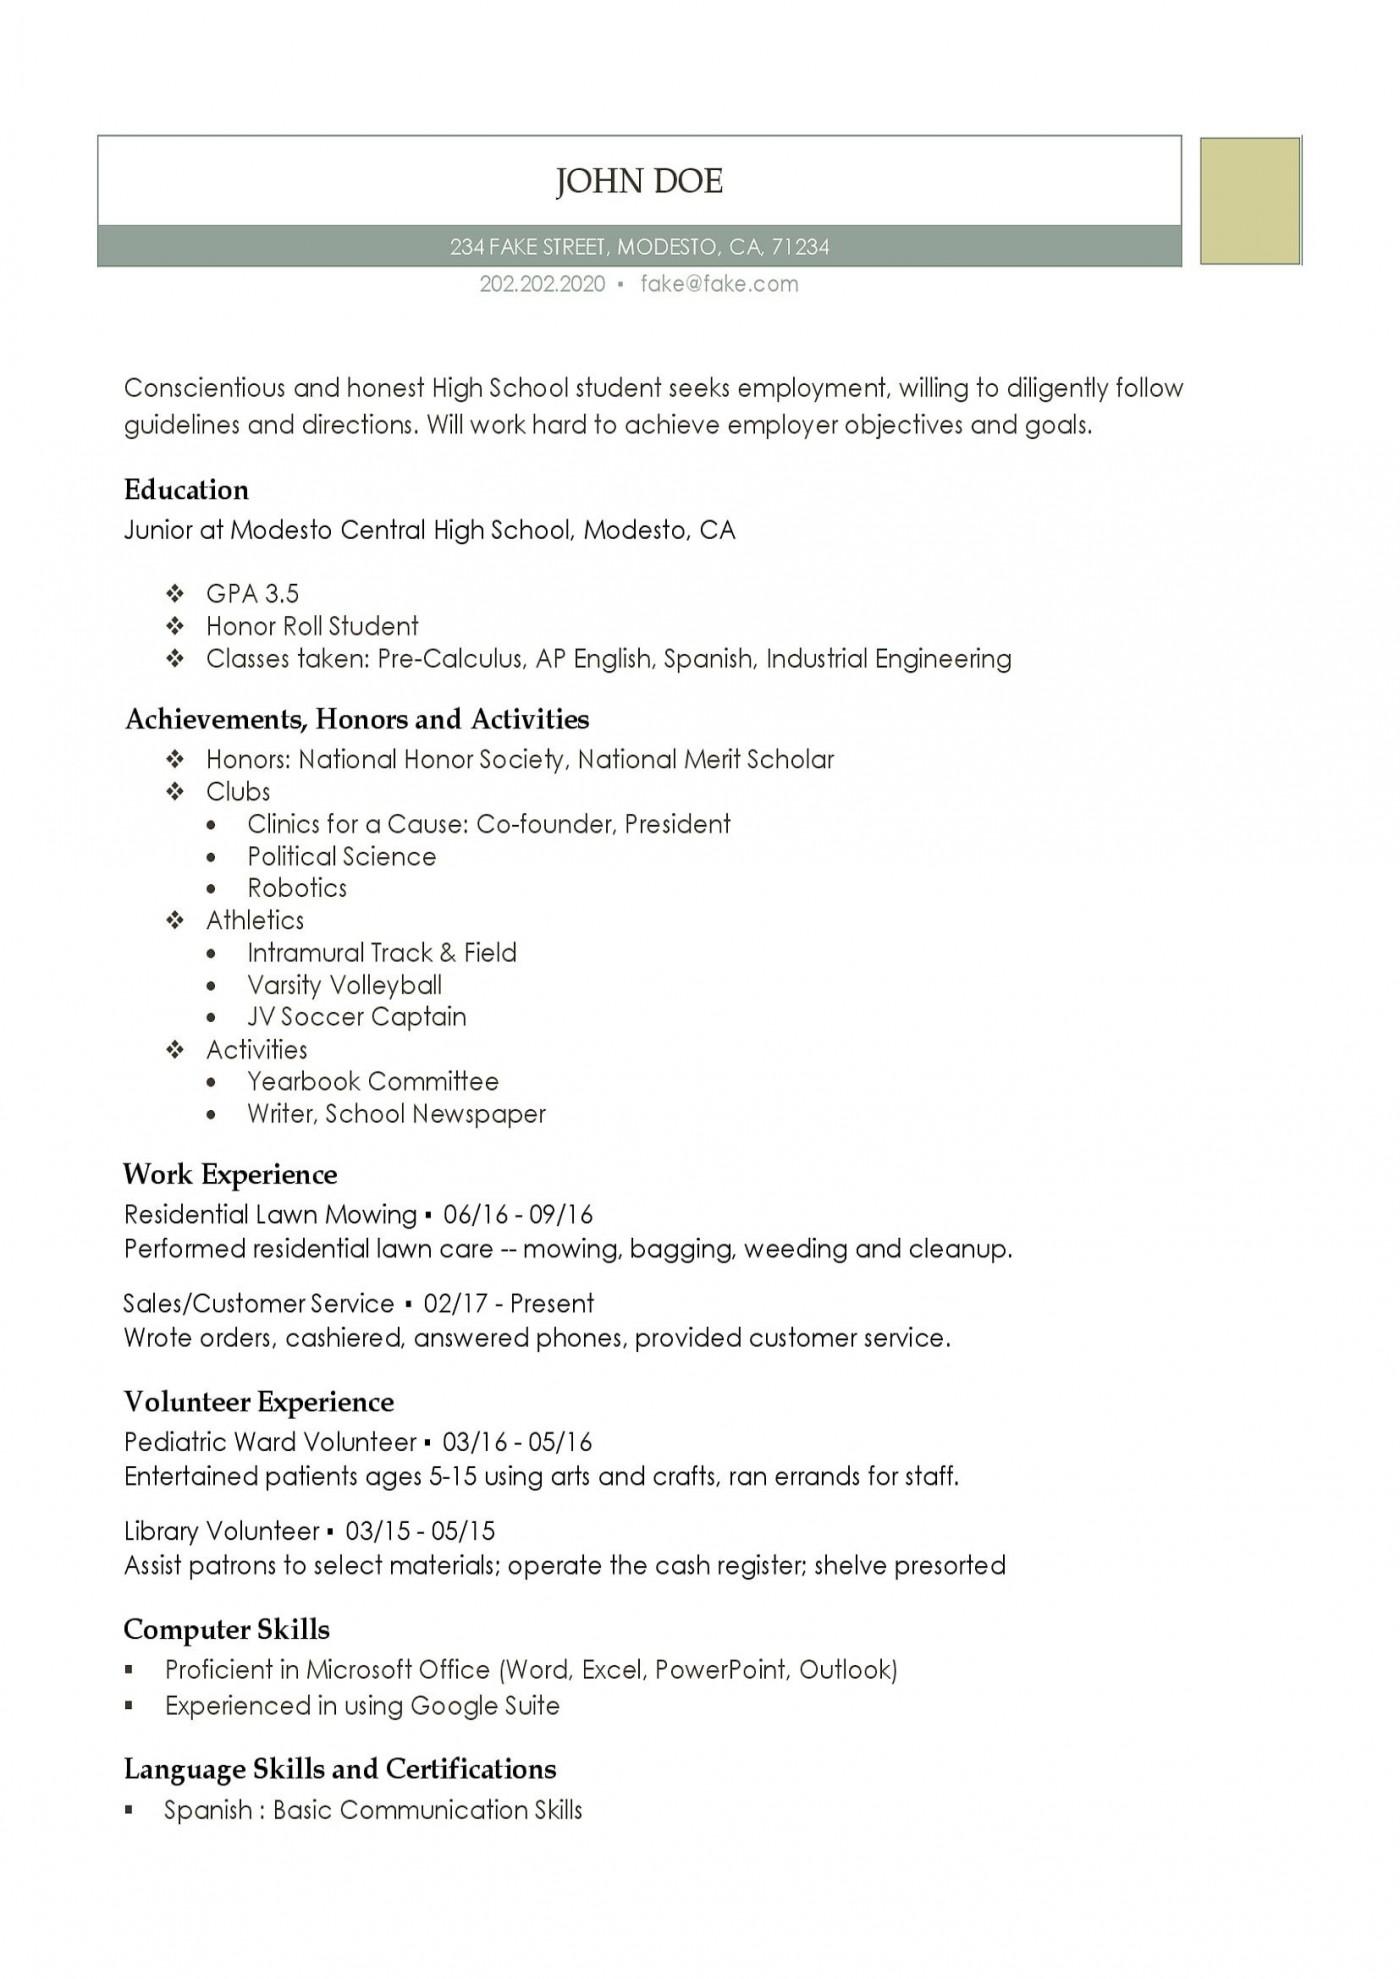 001 Formidable Resume Template High School Resolution  Student Australia For Google Doc Graduate Microsoft Word1400